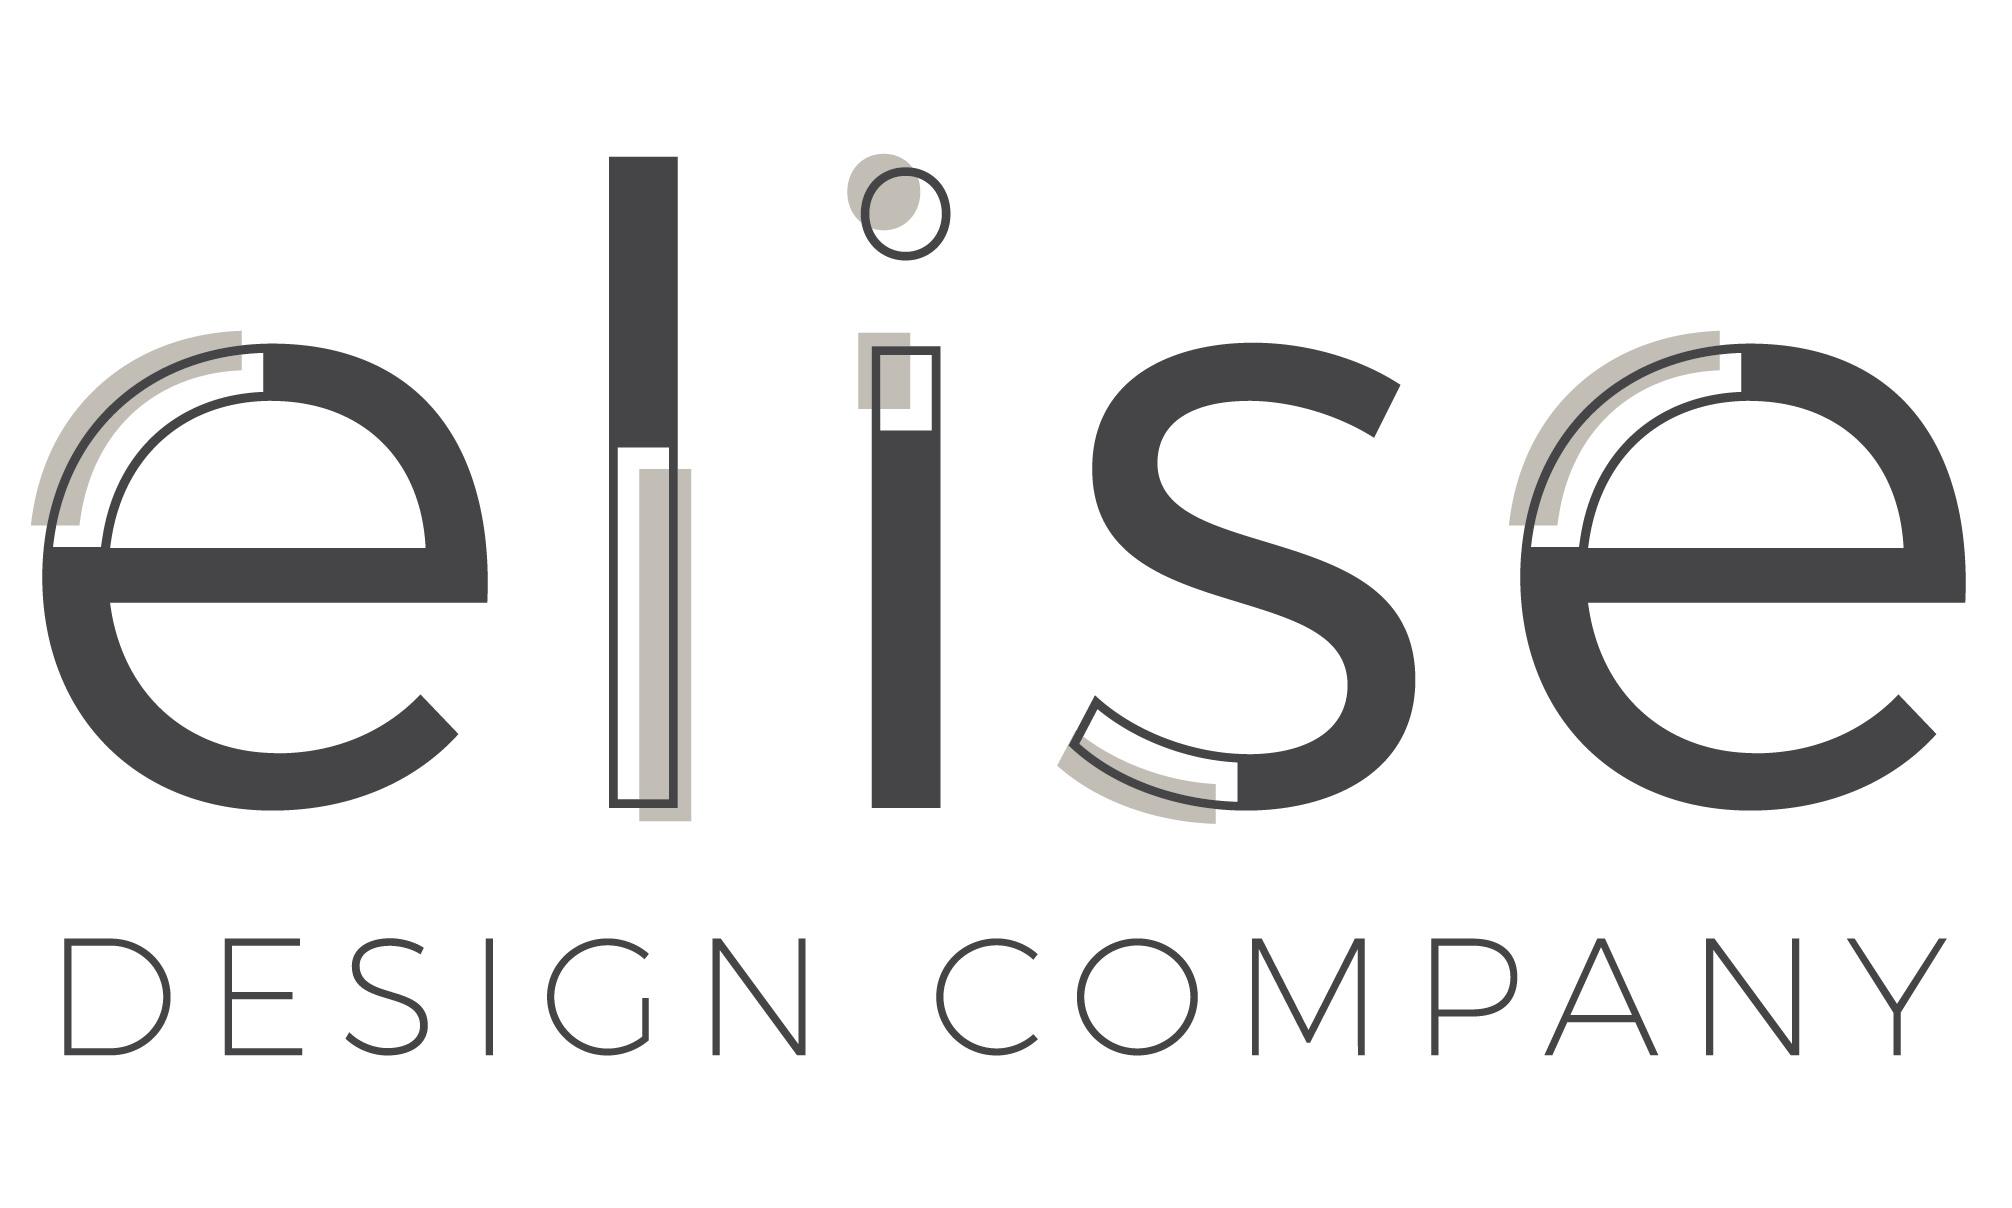 Elise Design Company